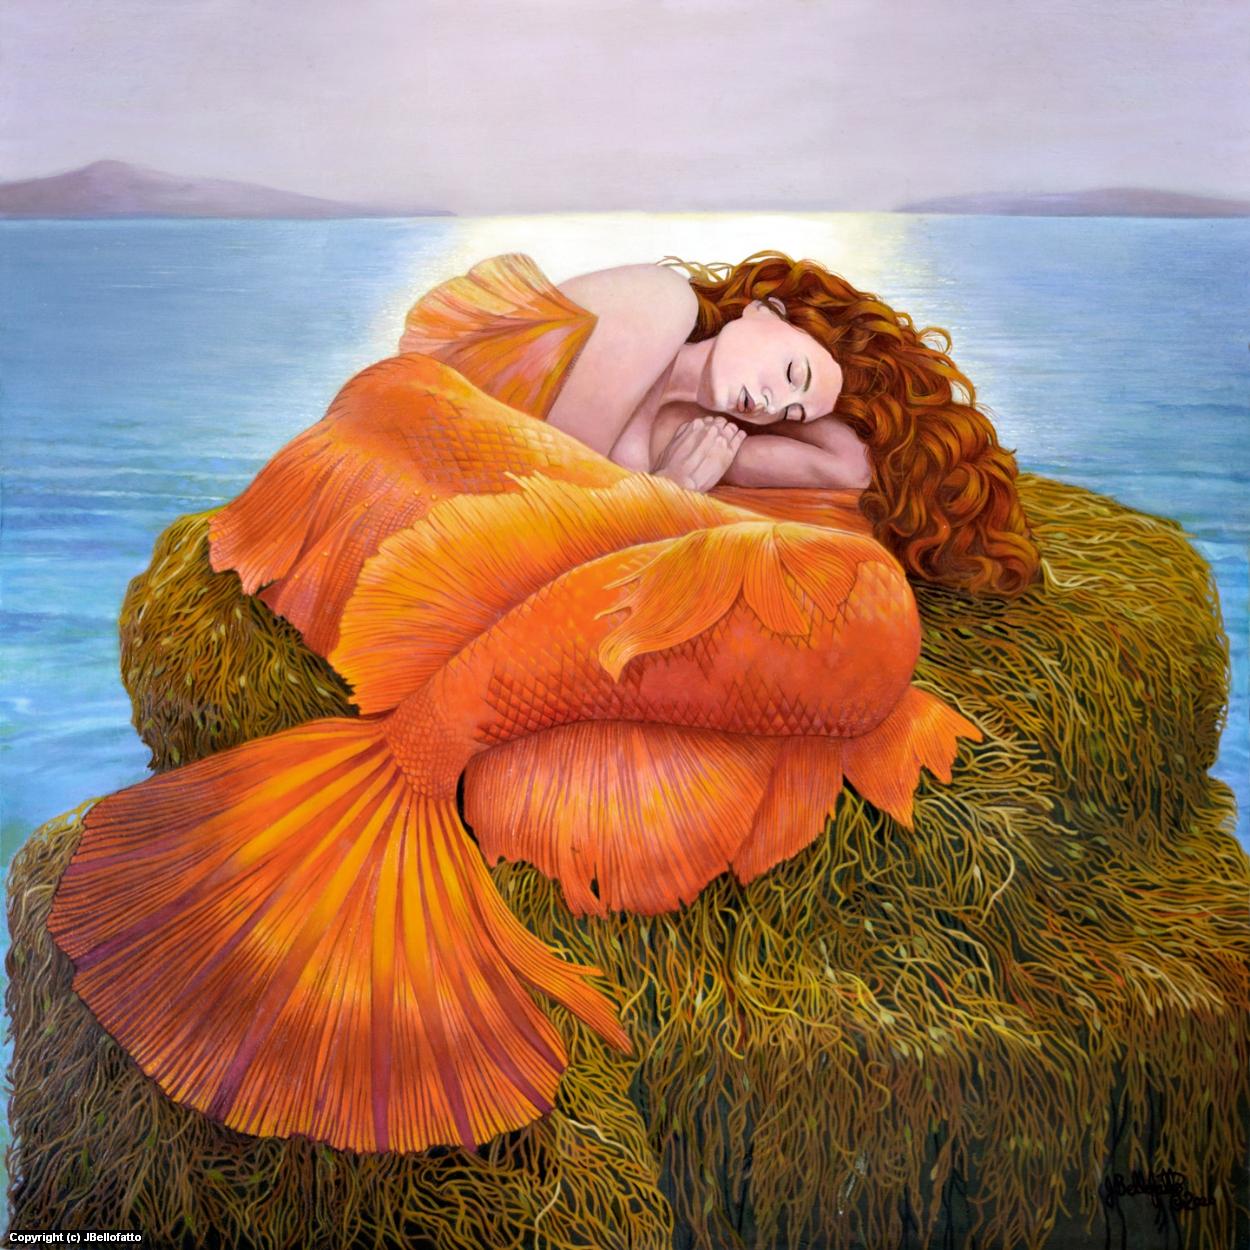 Siren's Slumber Artwork by Joseph Bellofatto